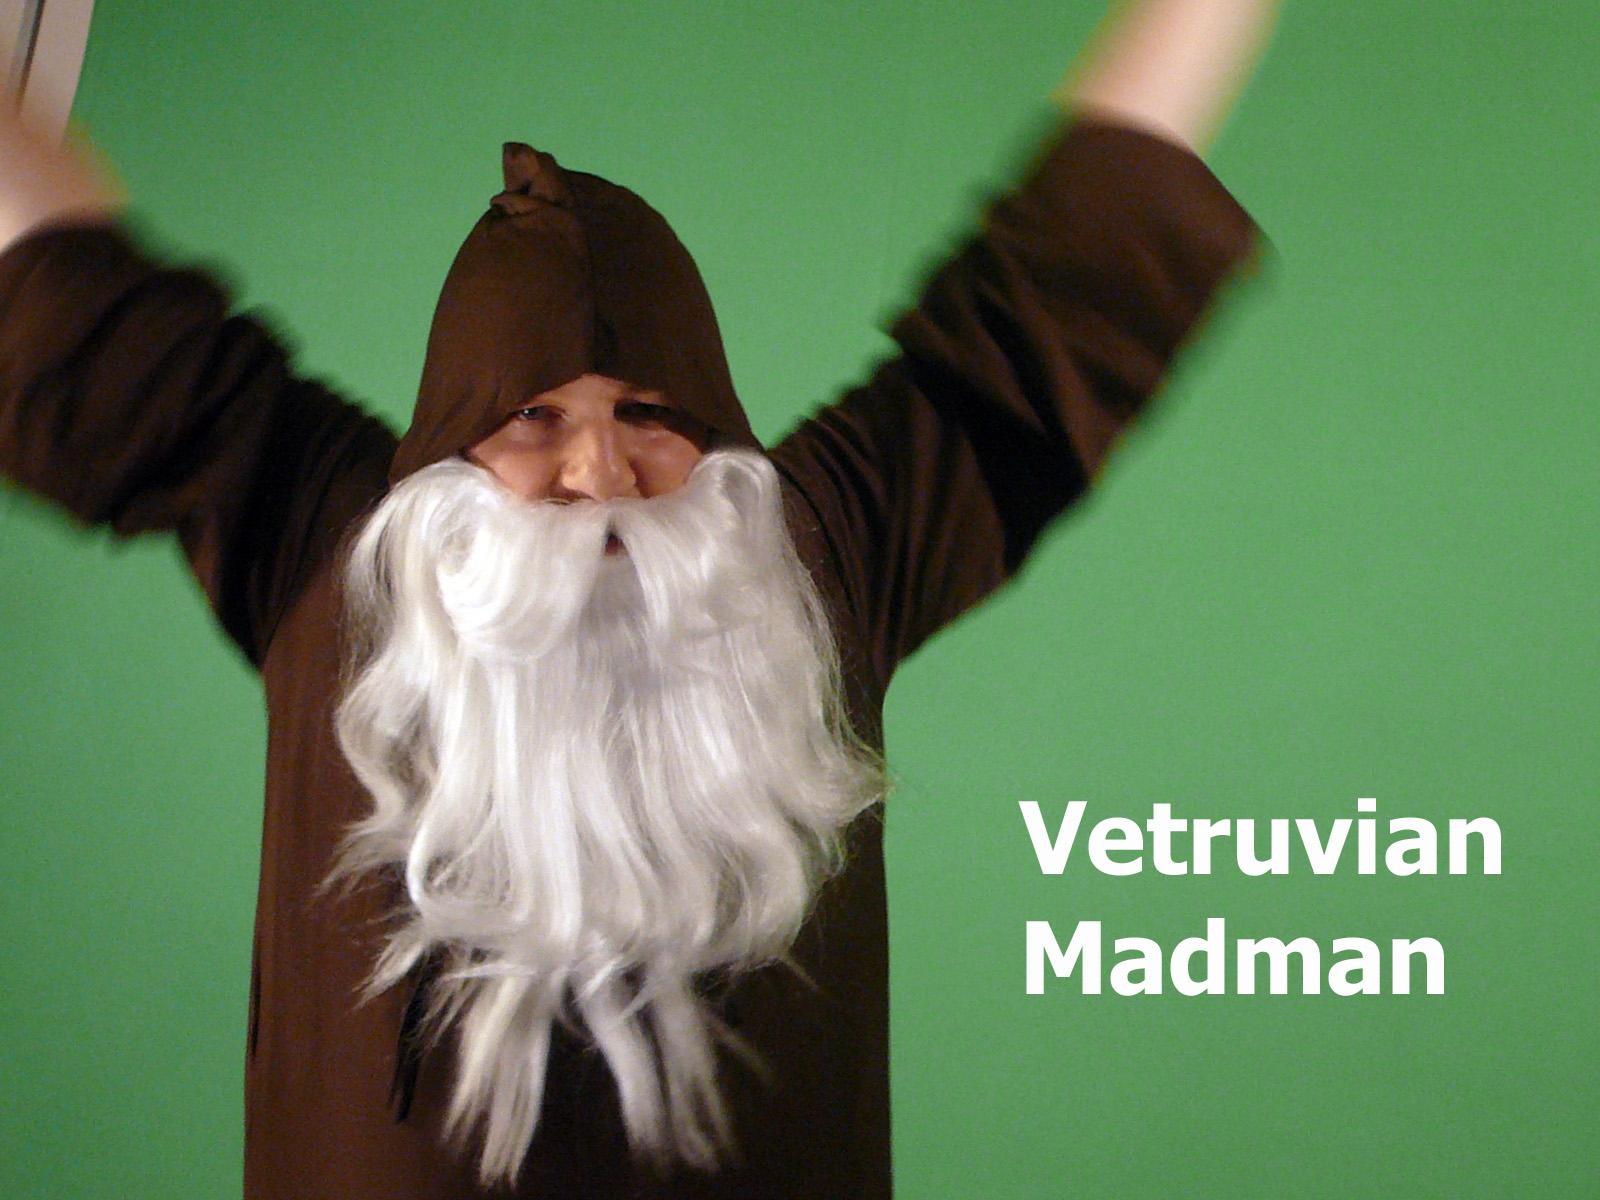 TMPs Vetruvian Madman!